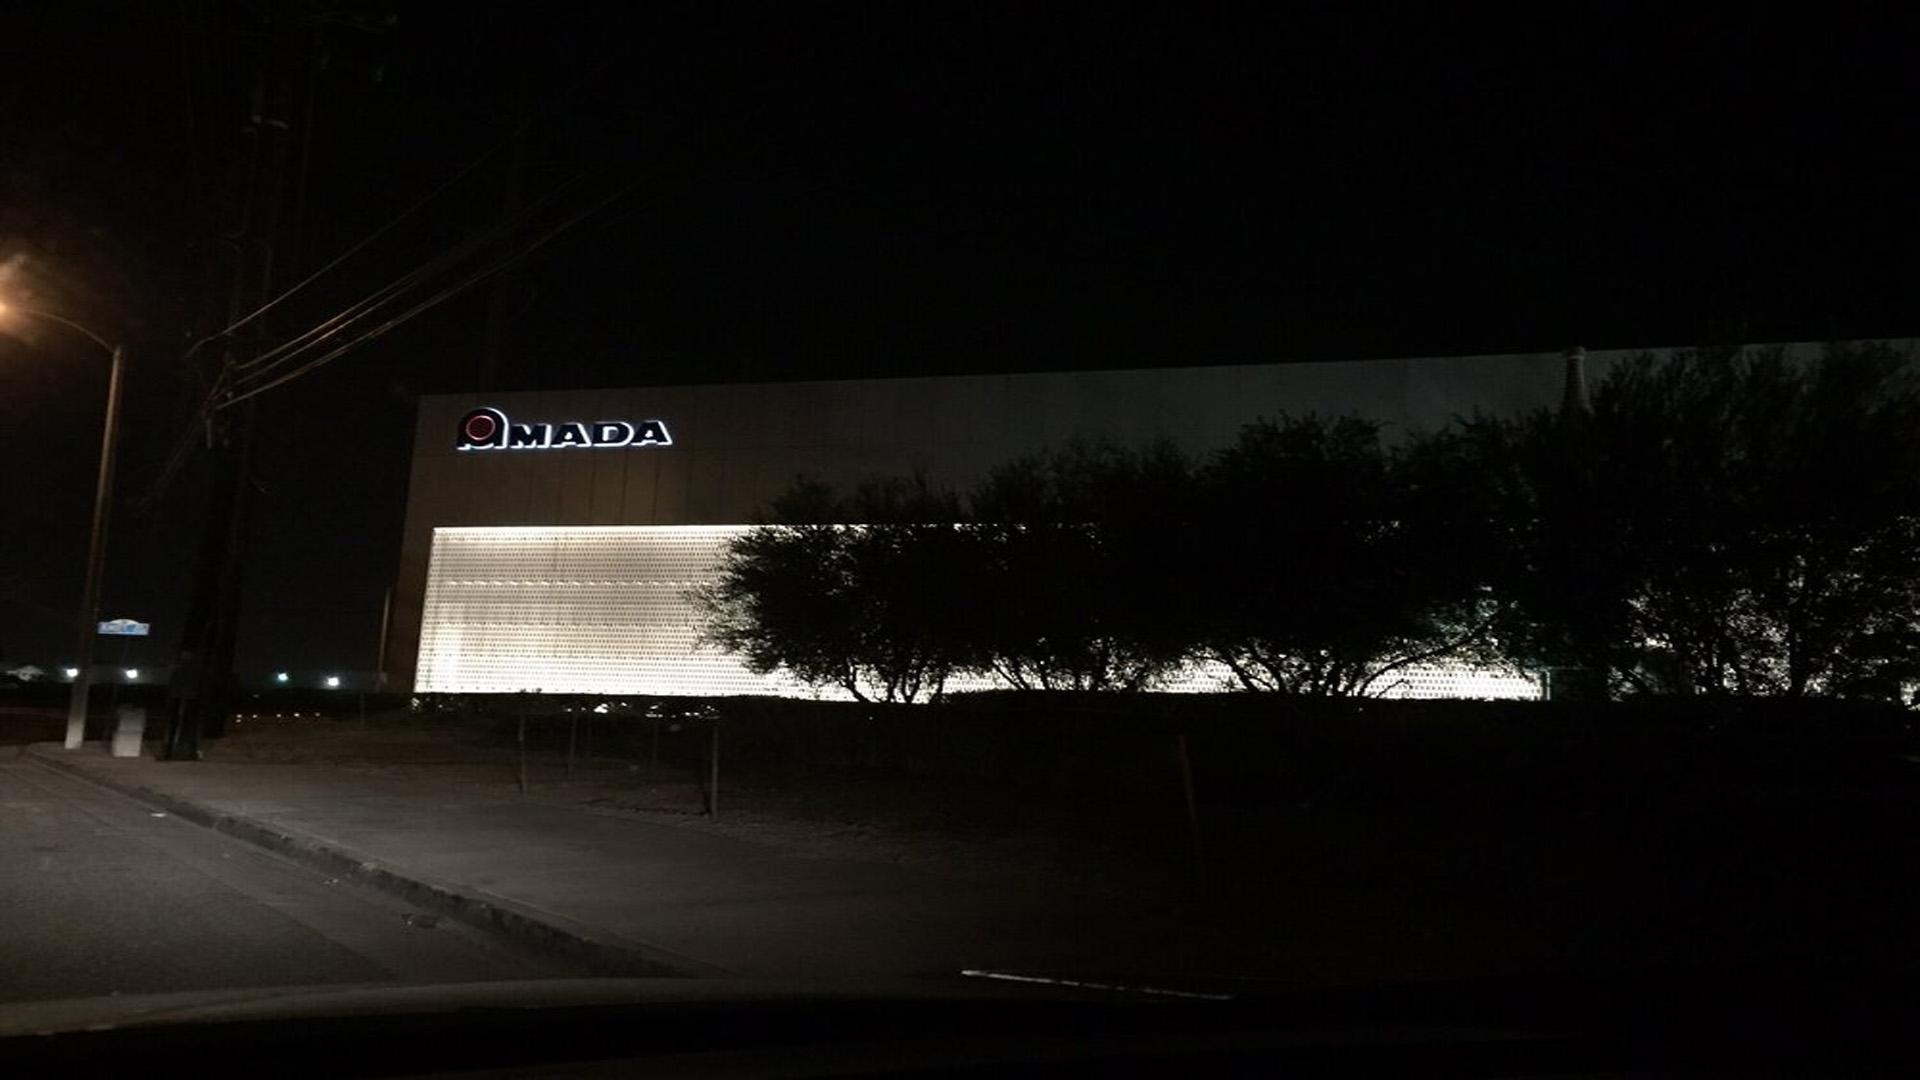 Amada Plaza | Corporate Events, Wedding Locations, Event